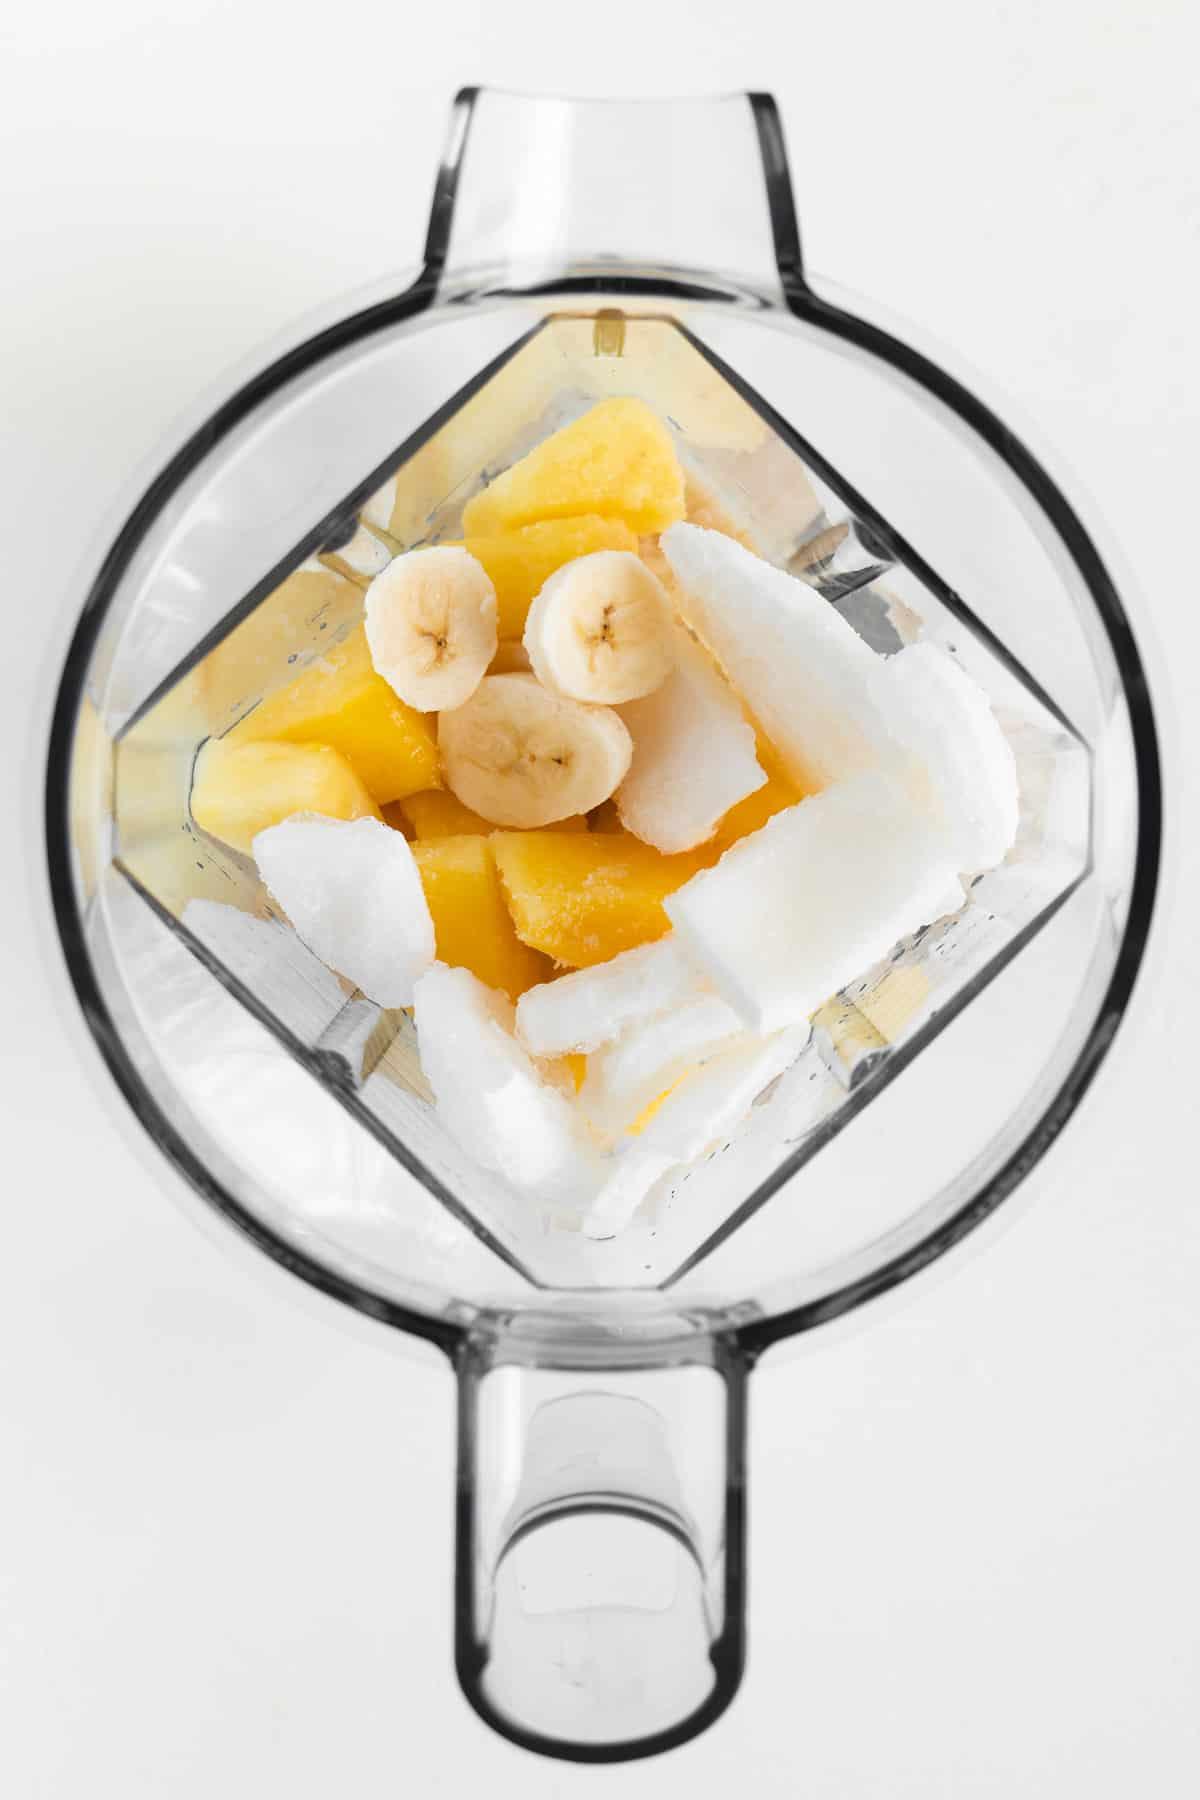 bananas, coconut, and pineapple inside a blender